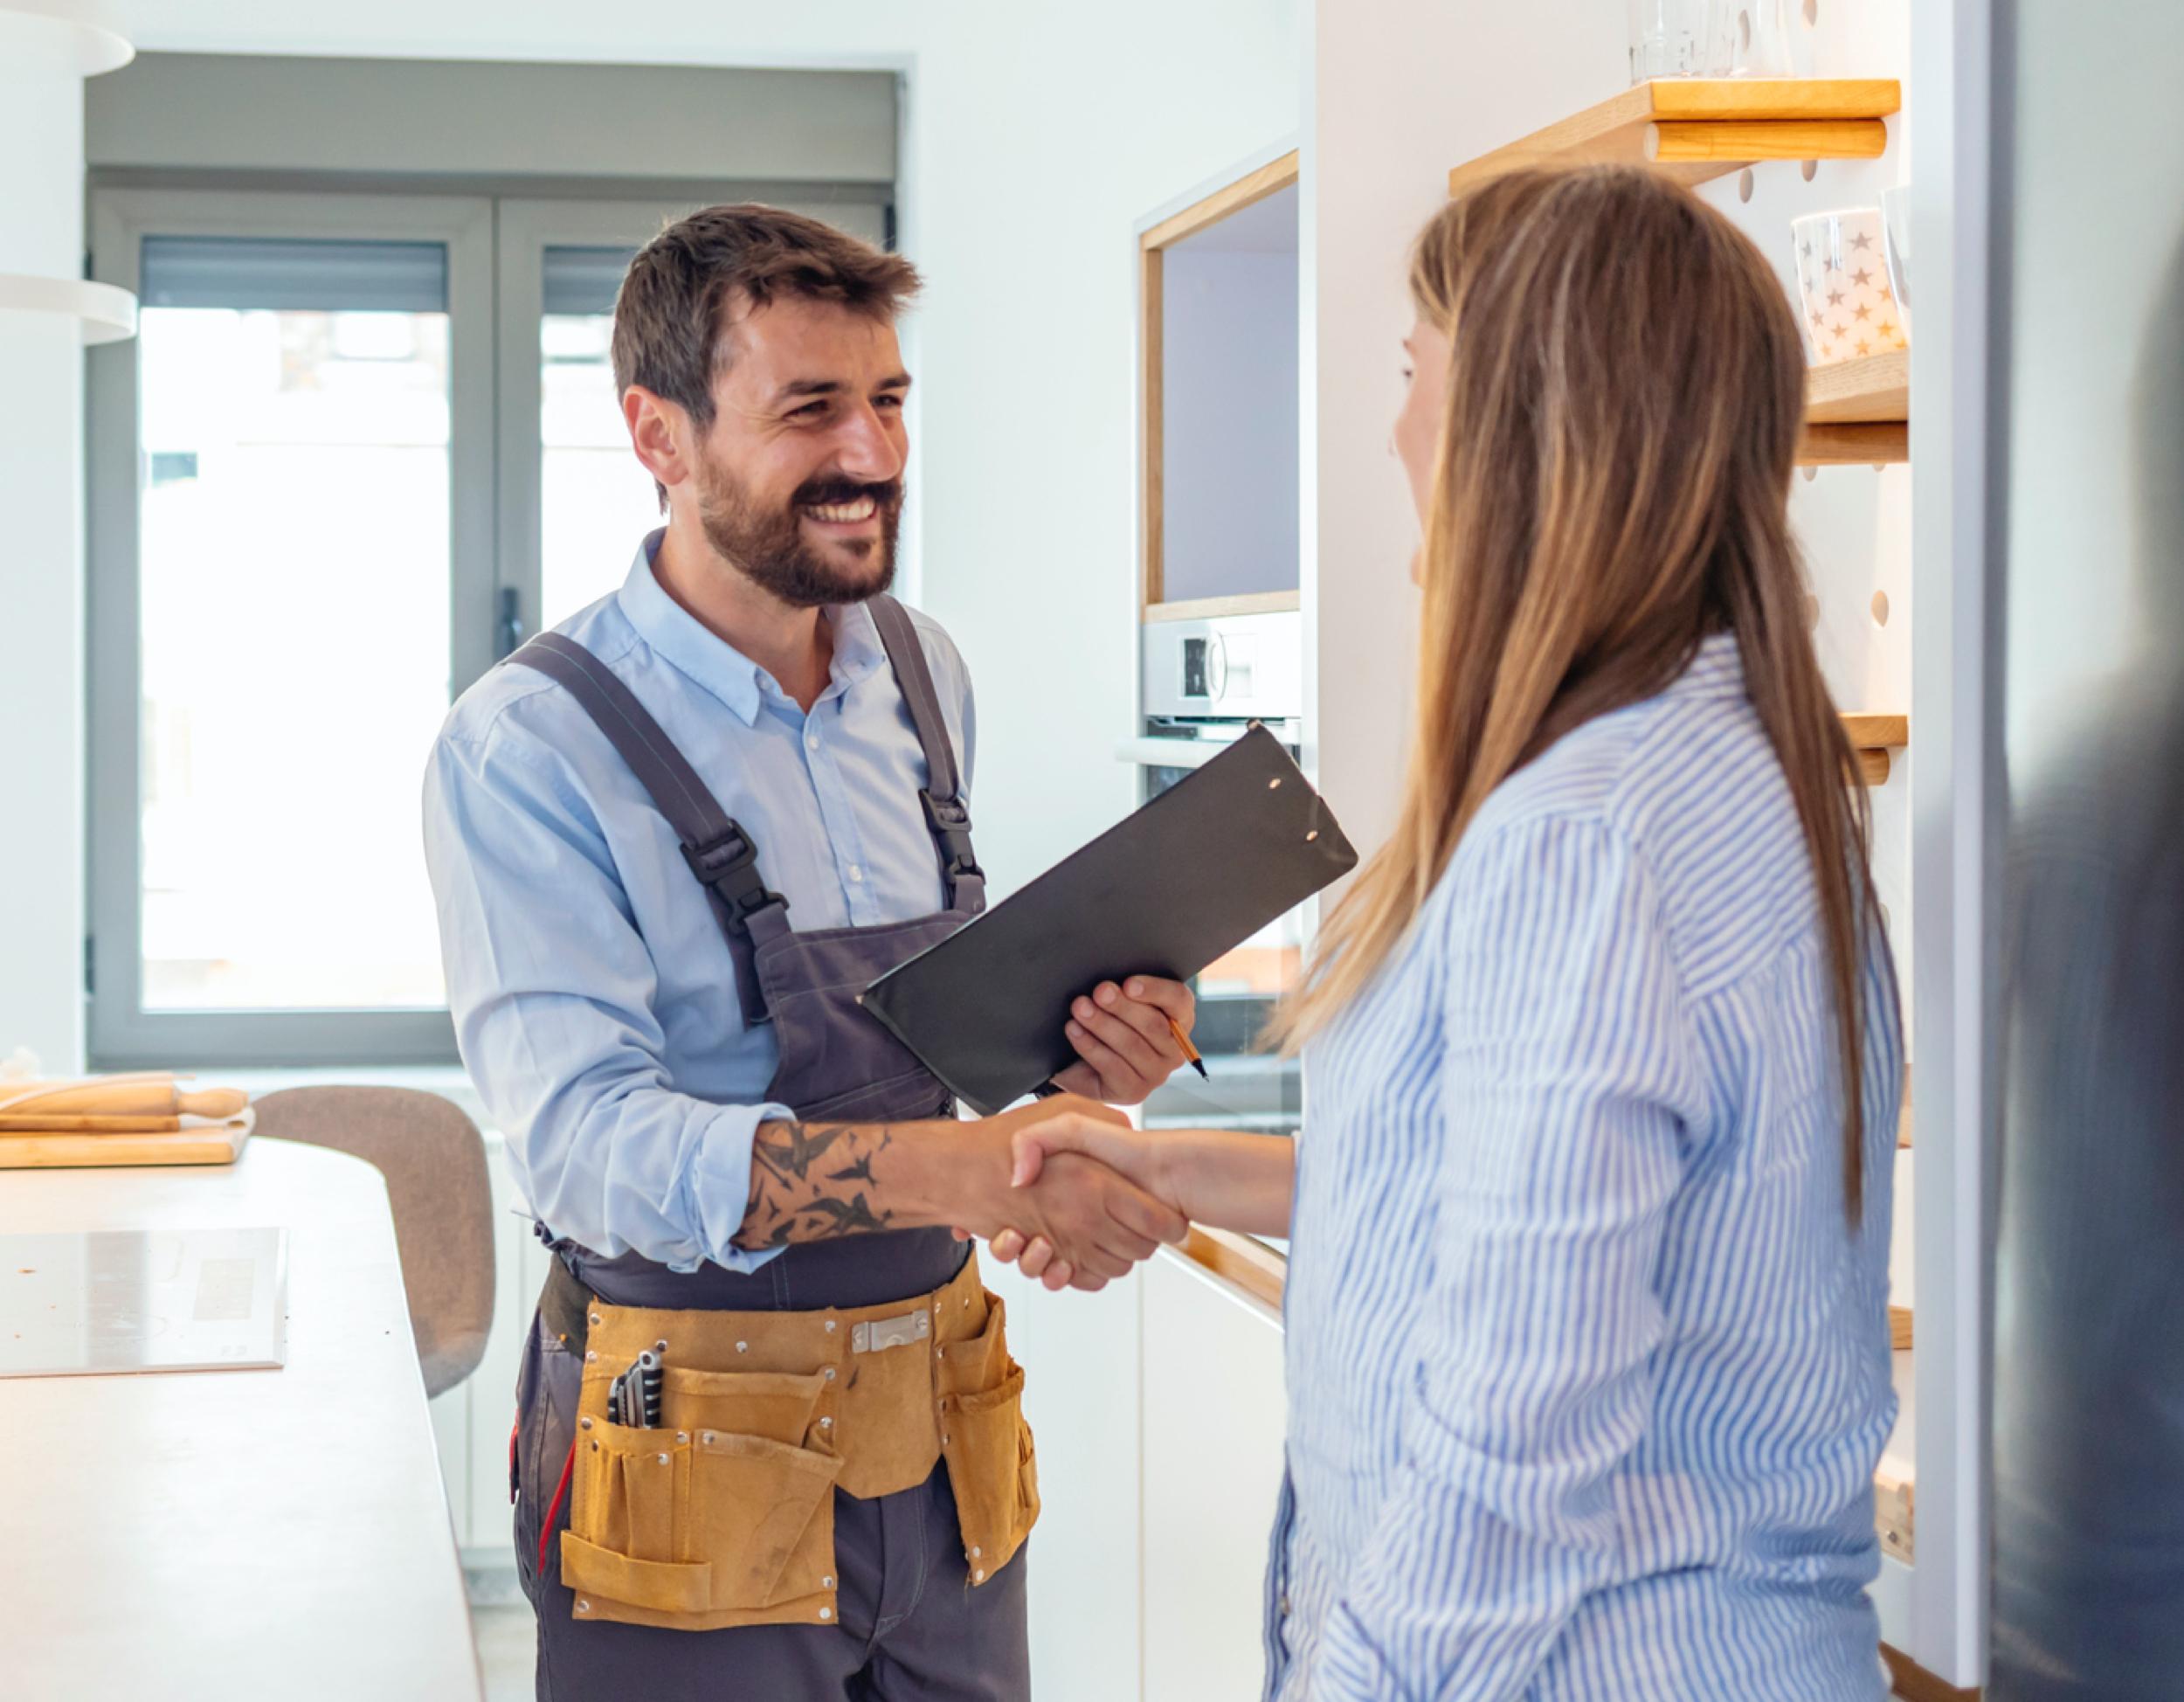 Installer with happy customer